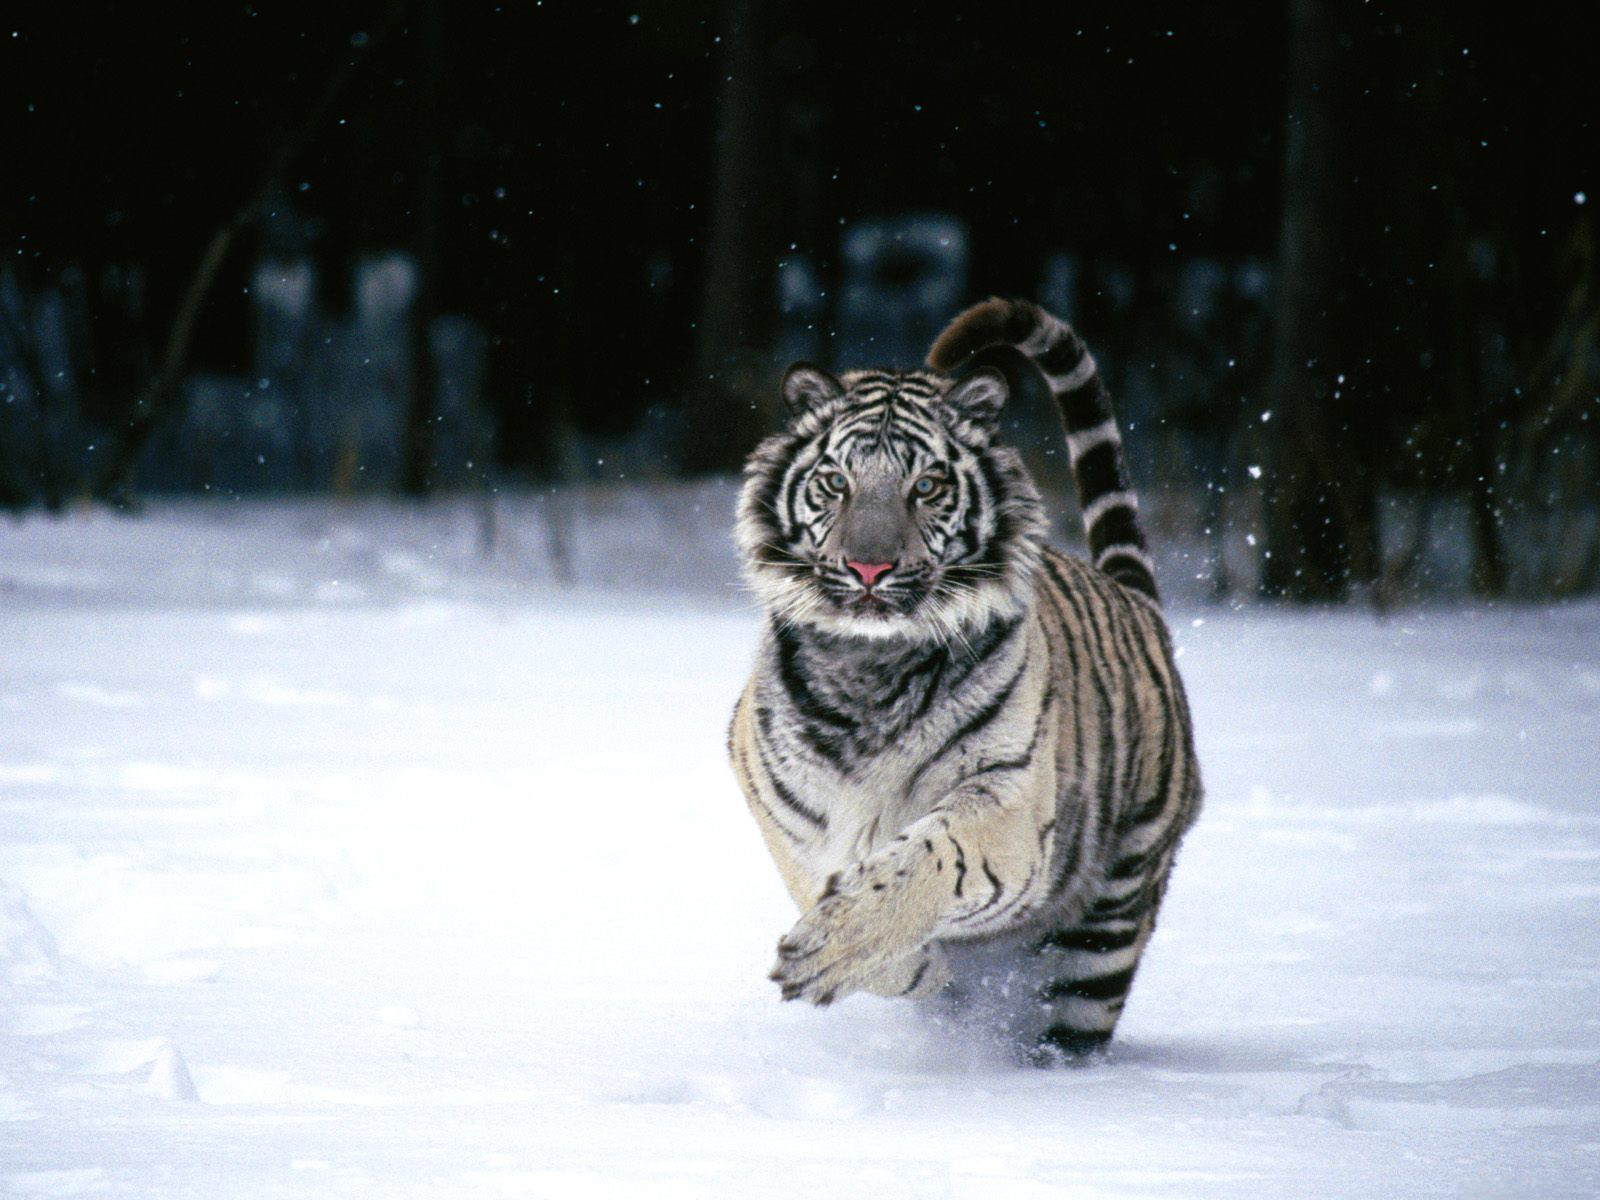 Running white tiger hd wallpaper 1600x1200